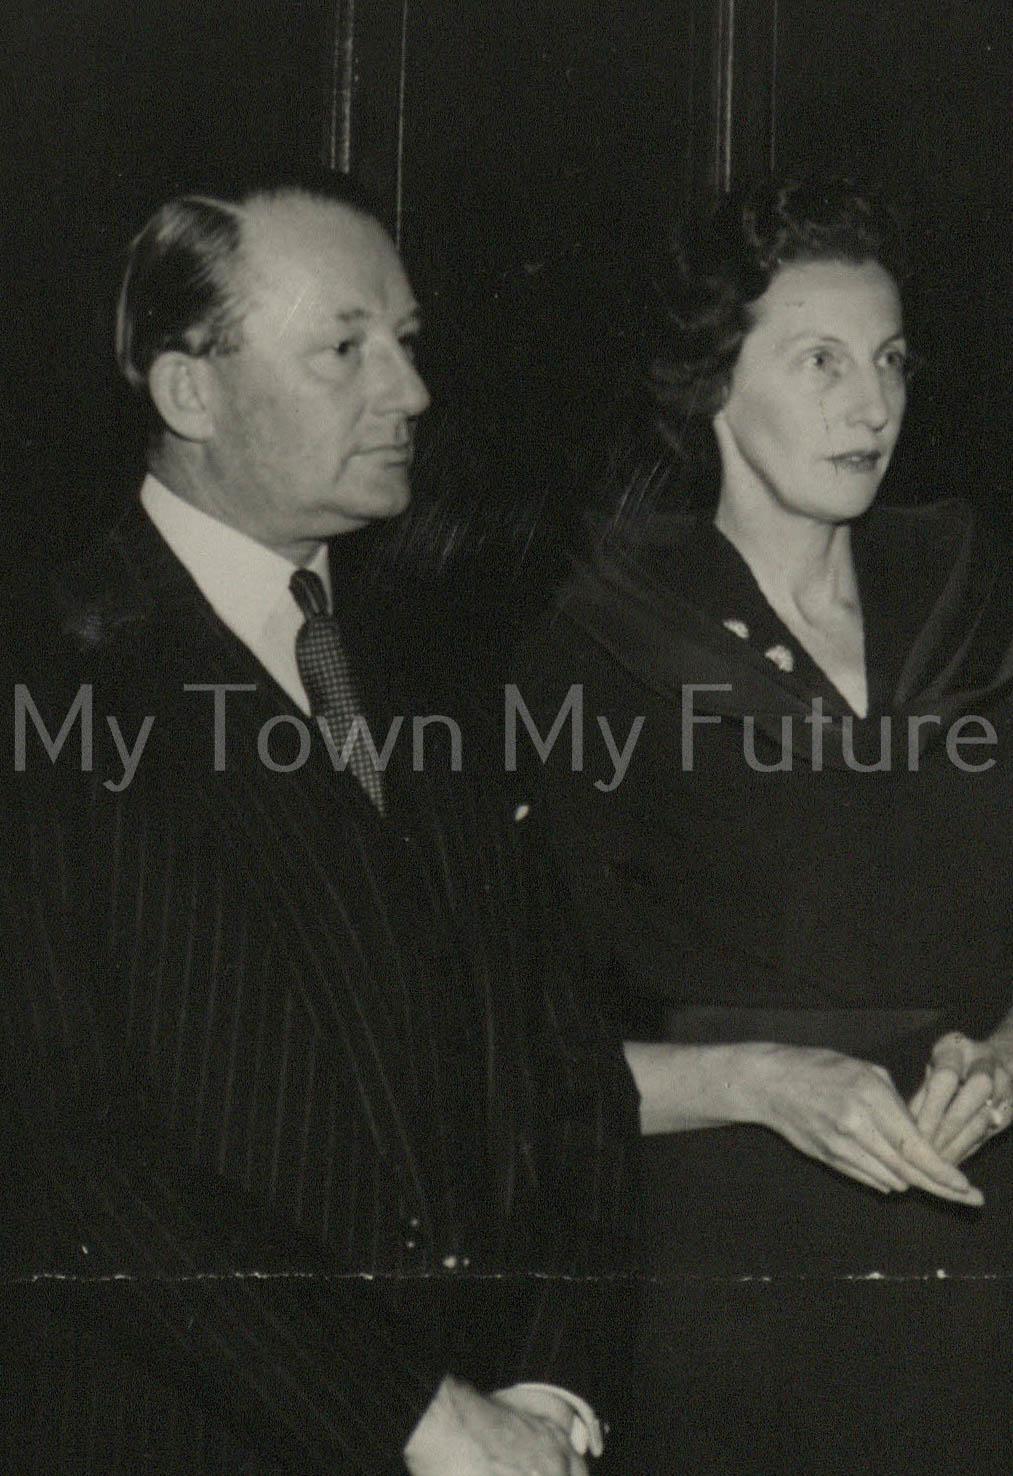 Sir John And Lady Wrightson